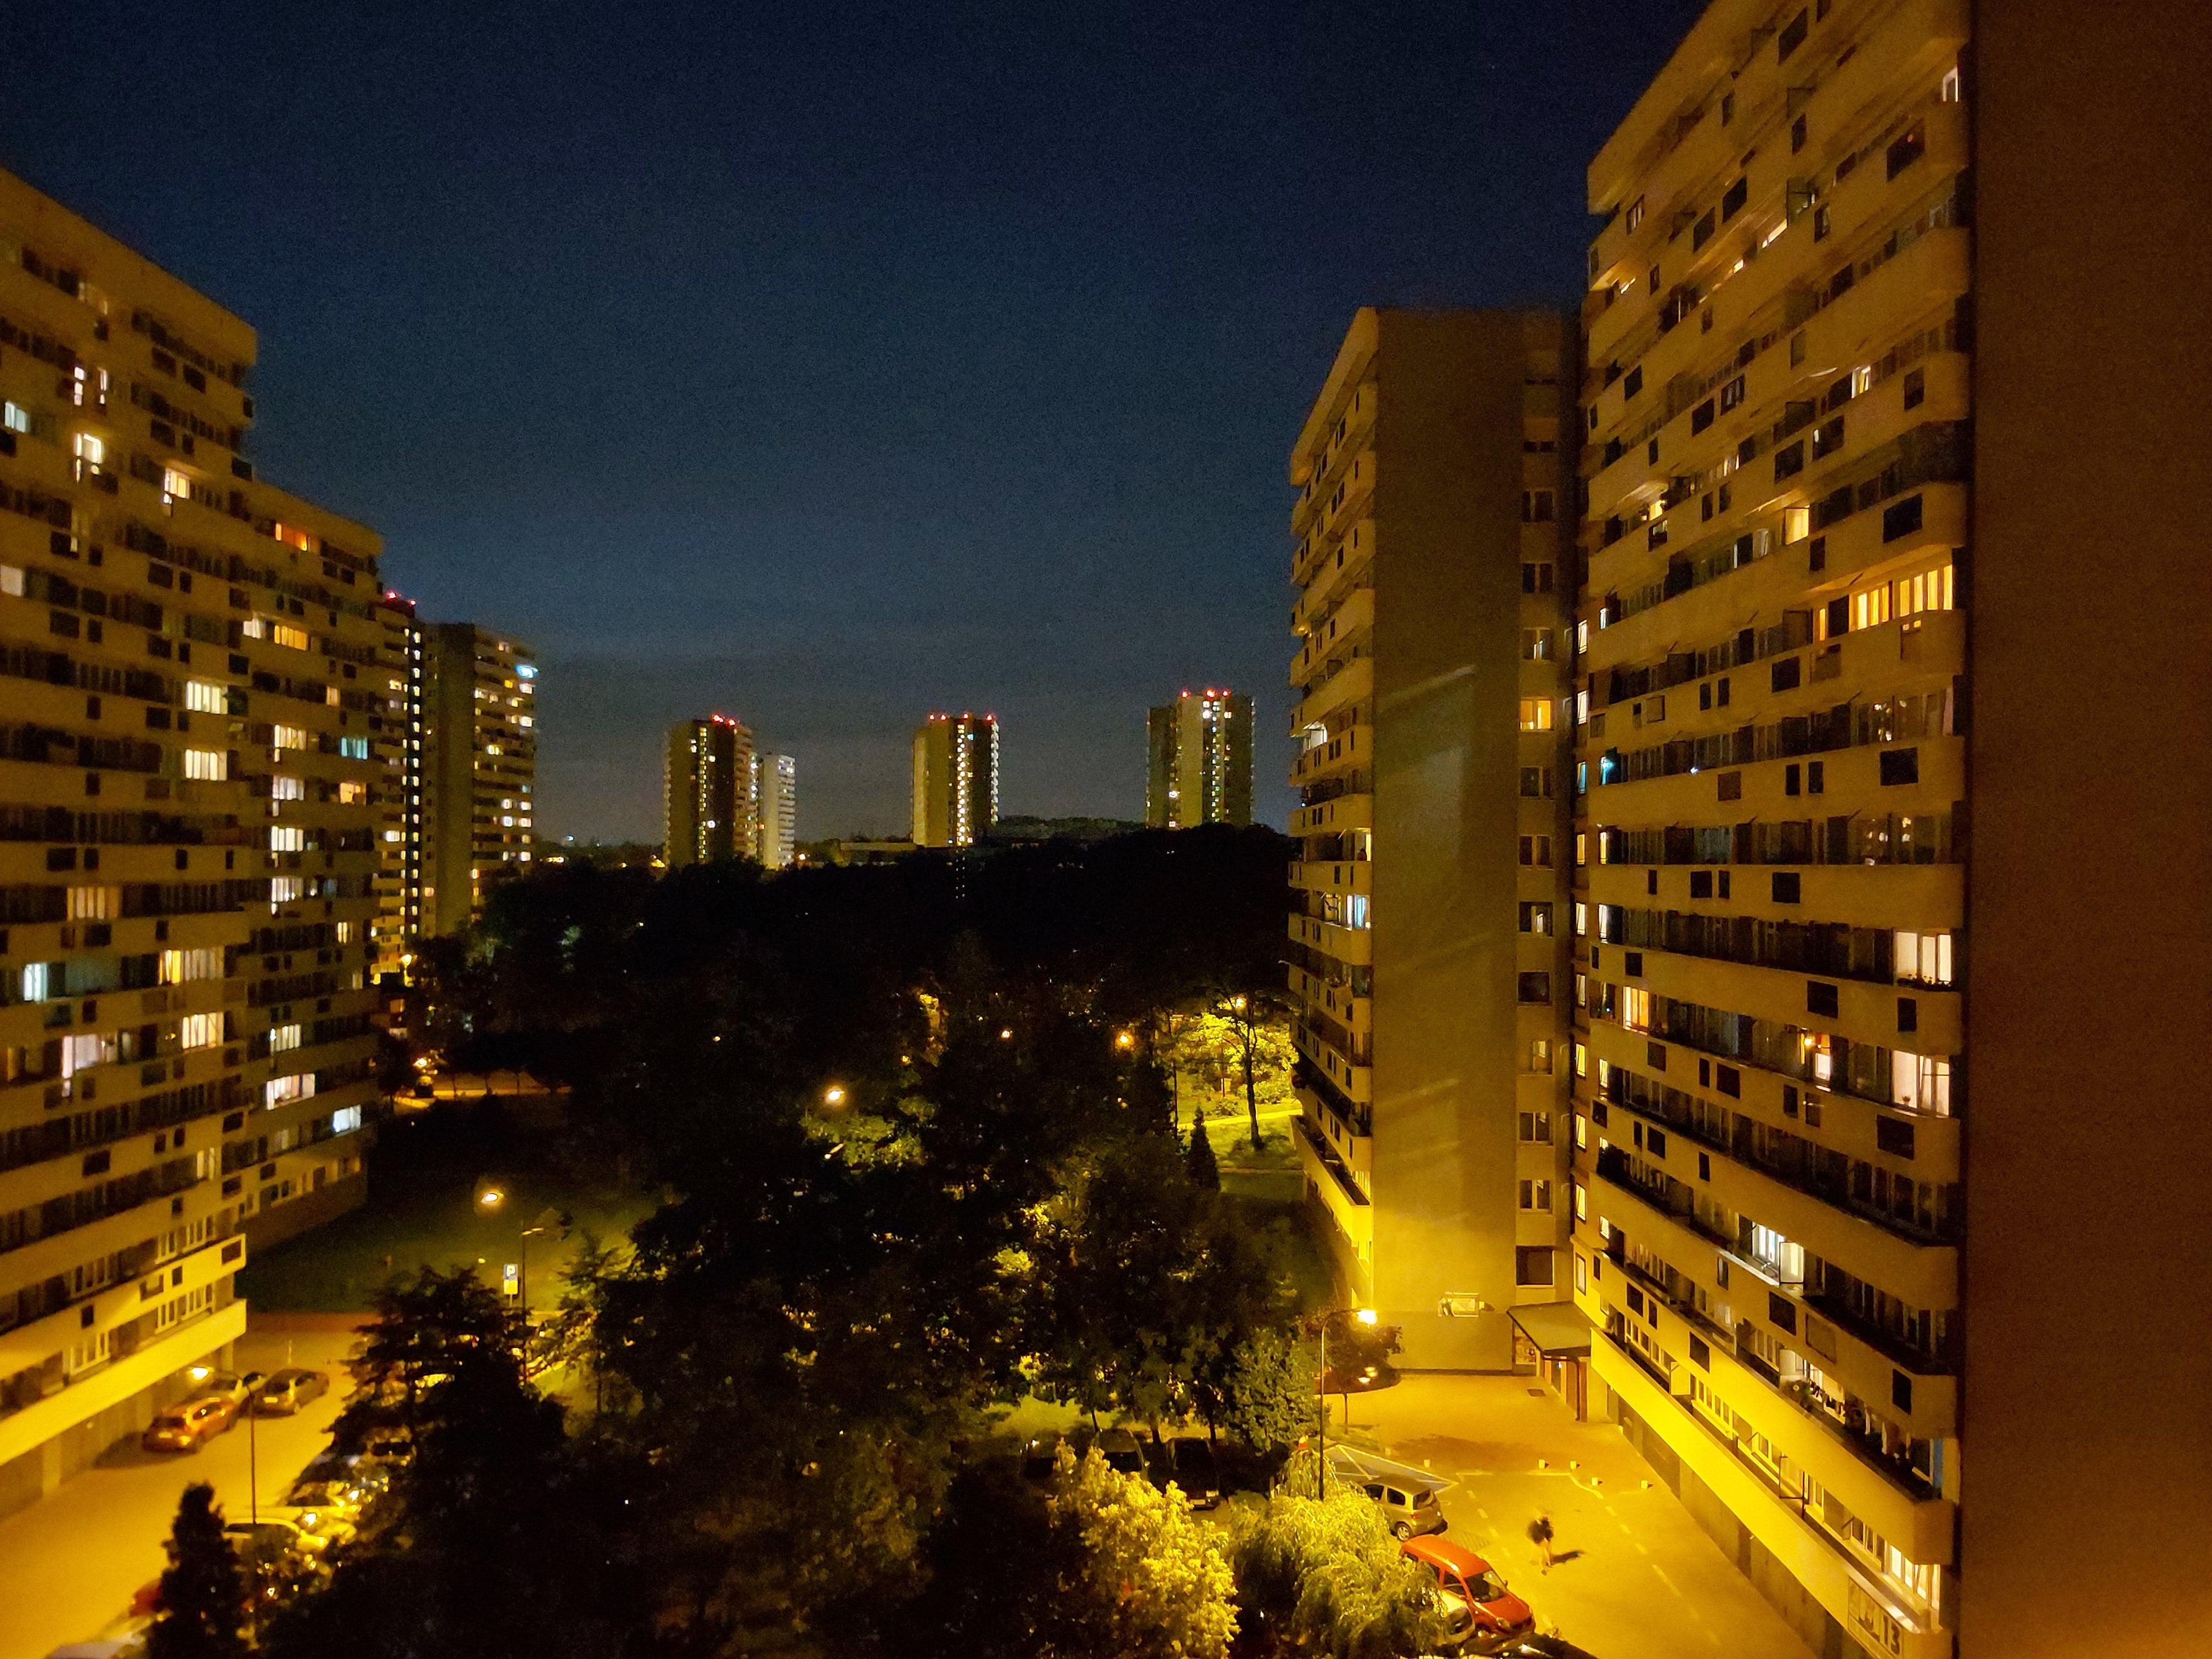 Zdjęcia nocne - Samsung Galaxy A70